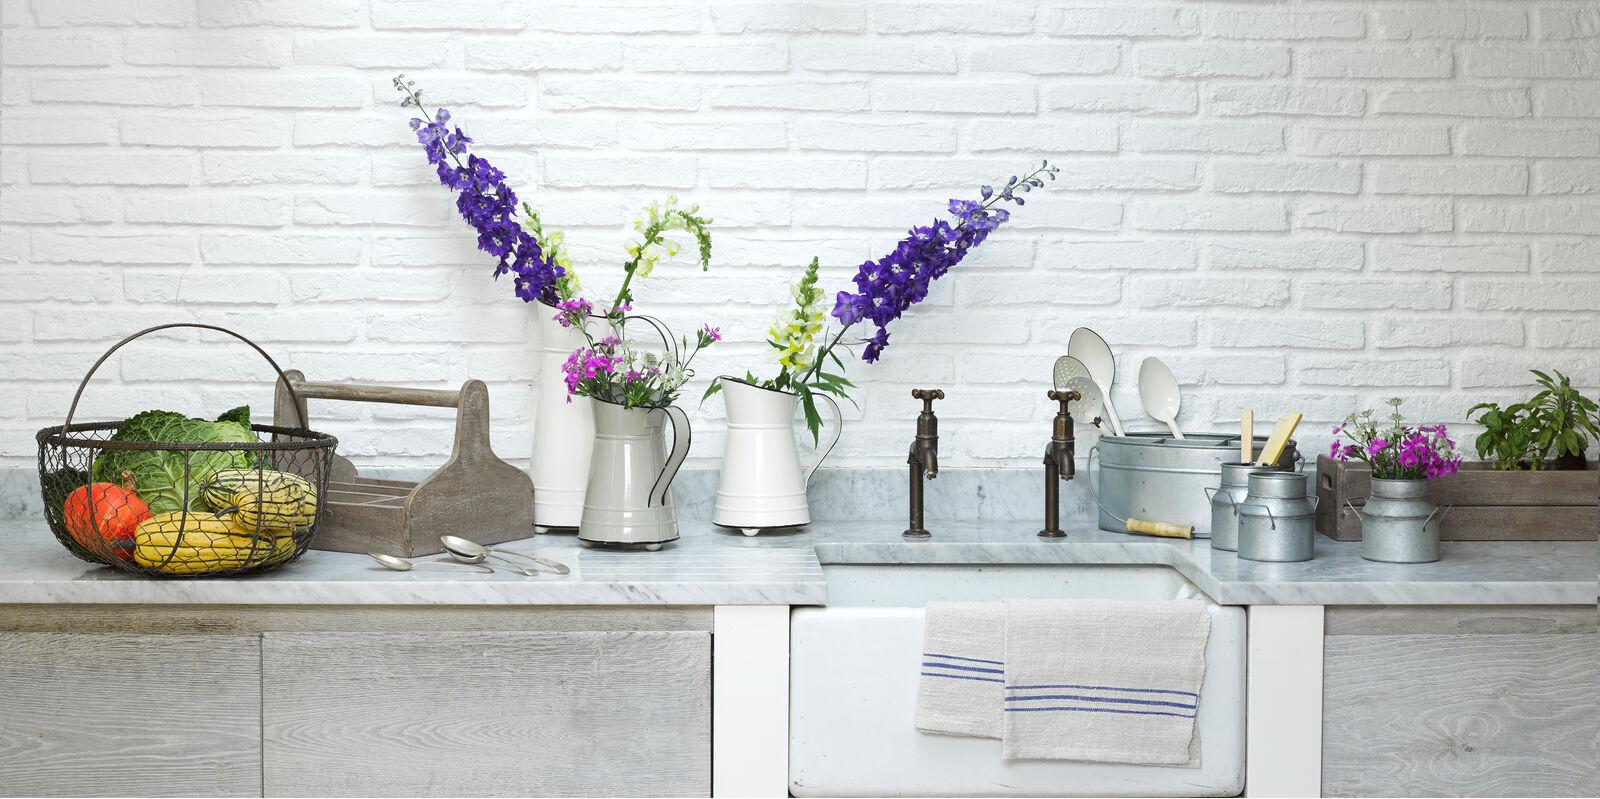 Range of kitchen tabletop accessories